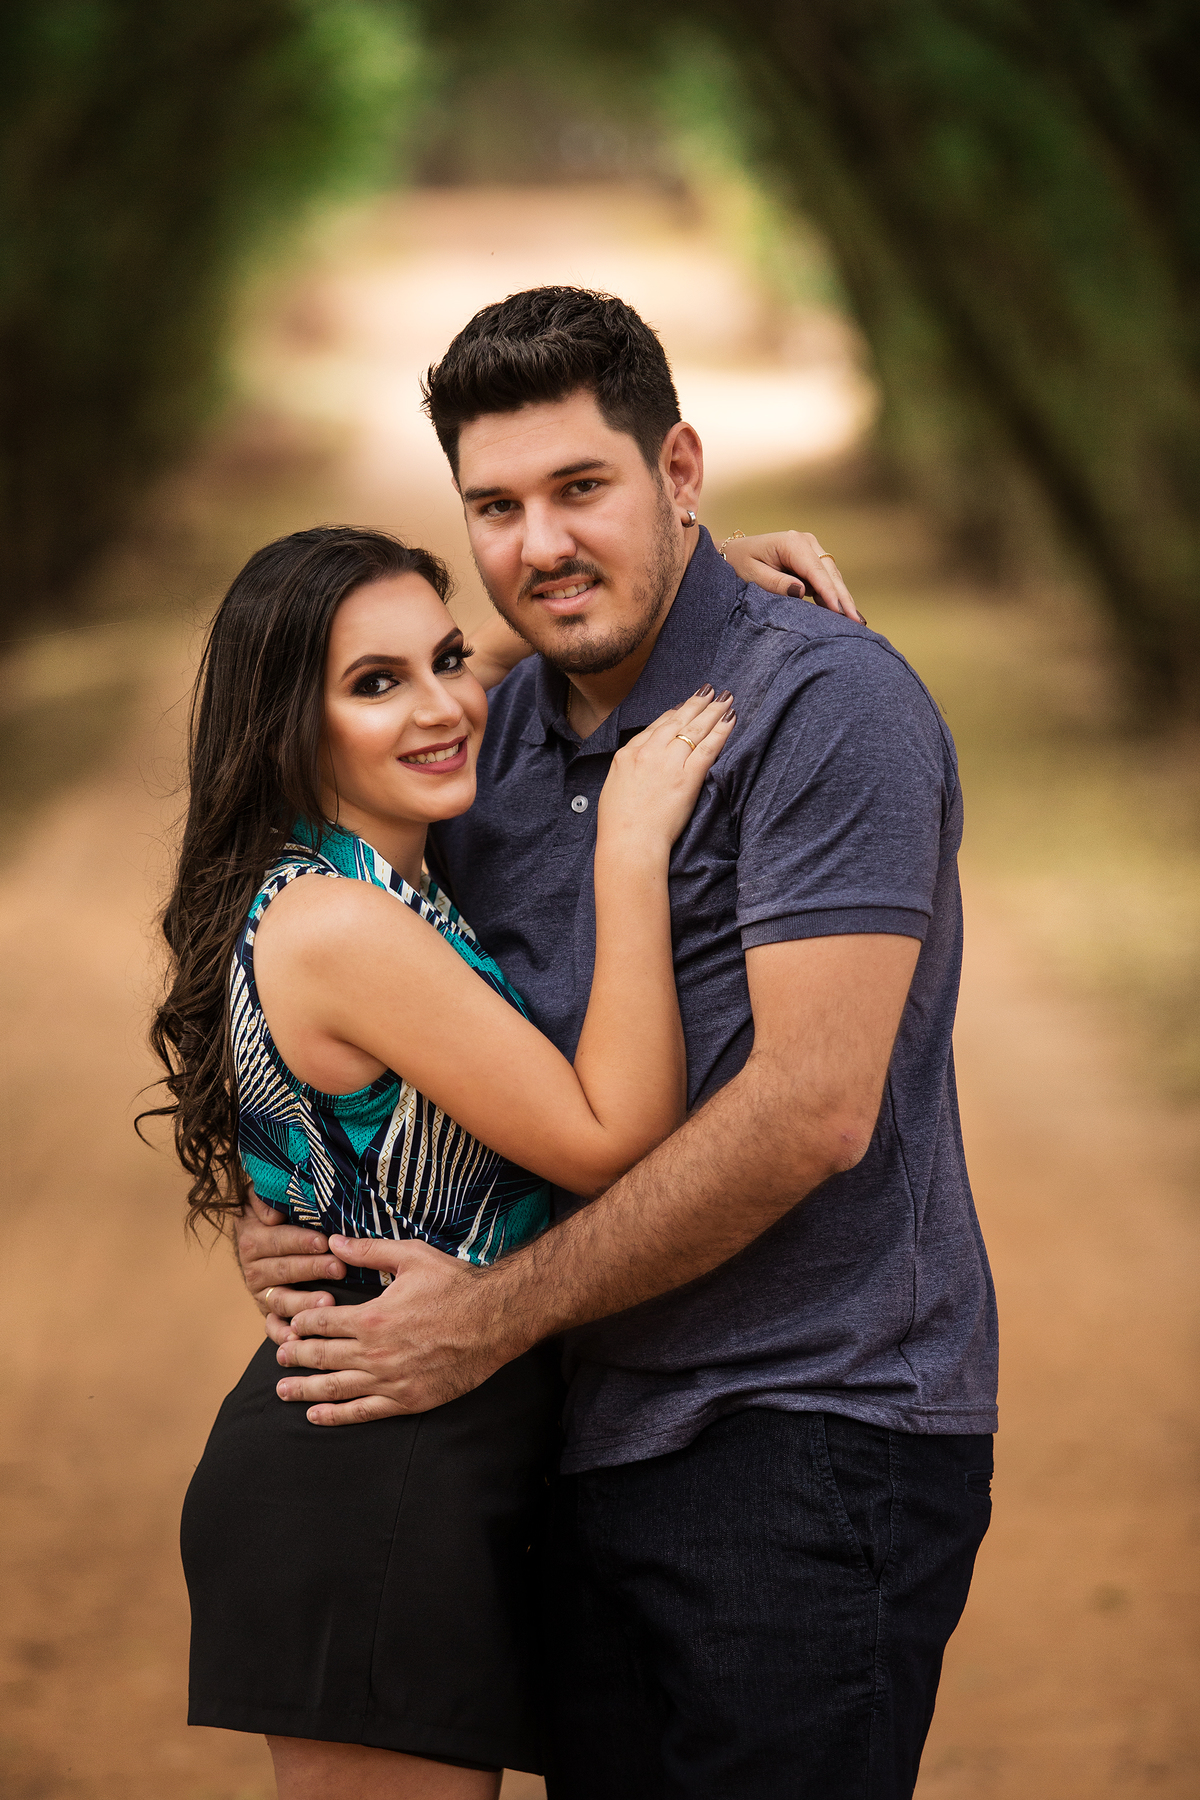 Imagem capa - Ensaio Pré Wedding Zaila e Bruno por ERIK VINICIUS PAVAN FARIA 36976885889